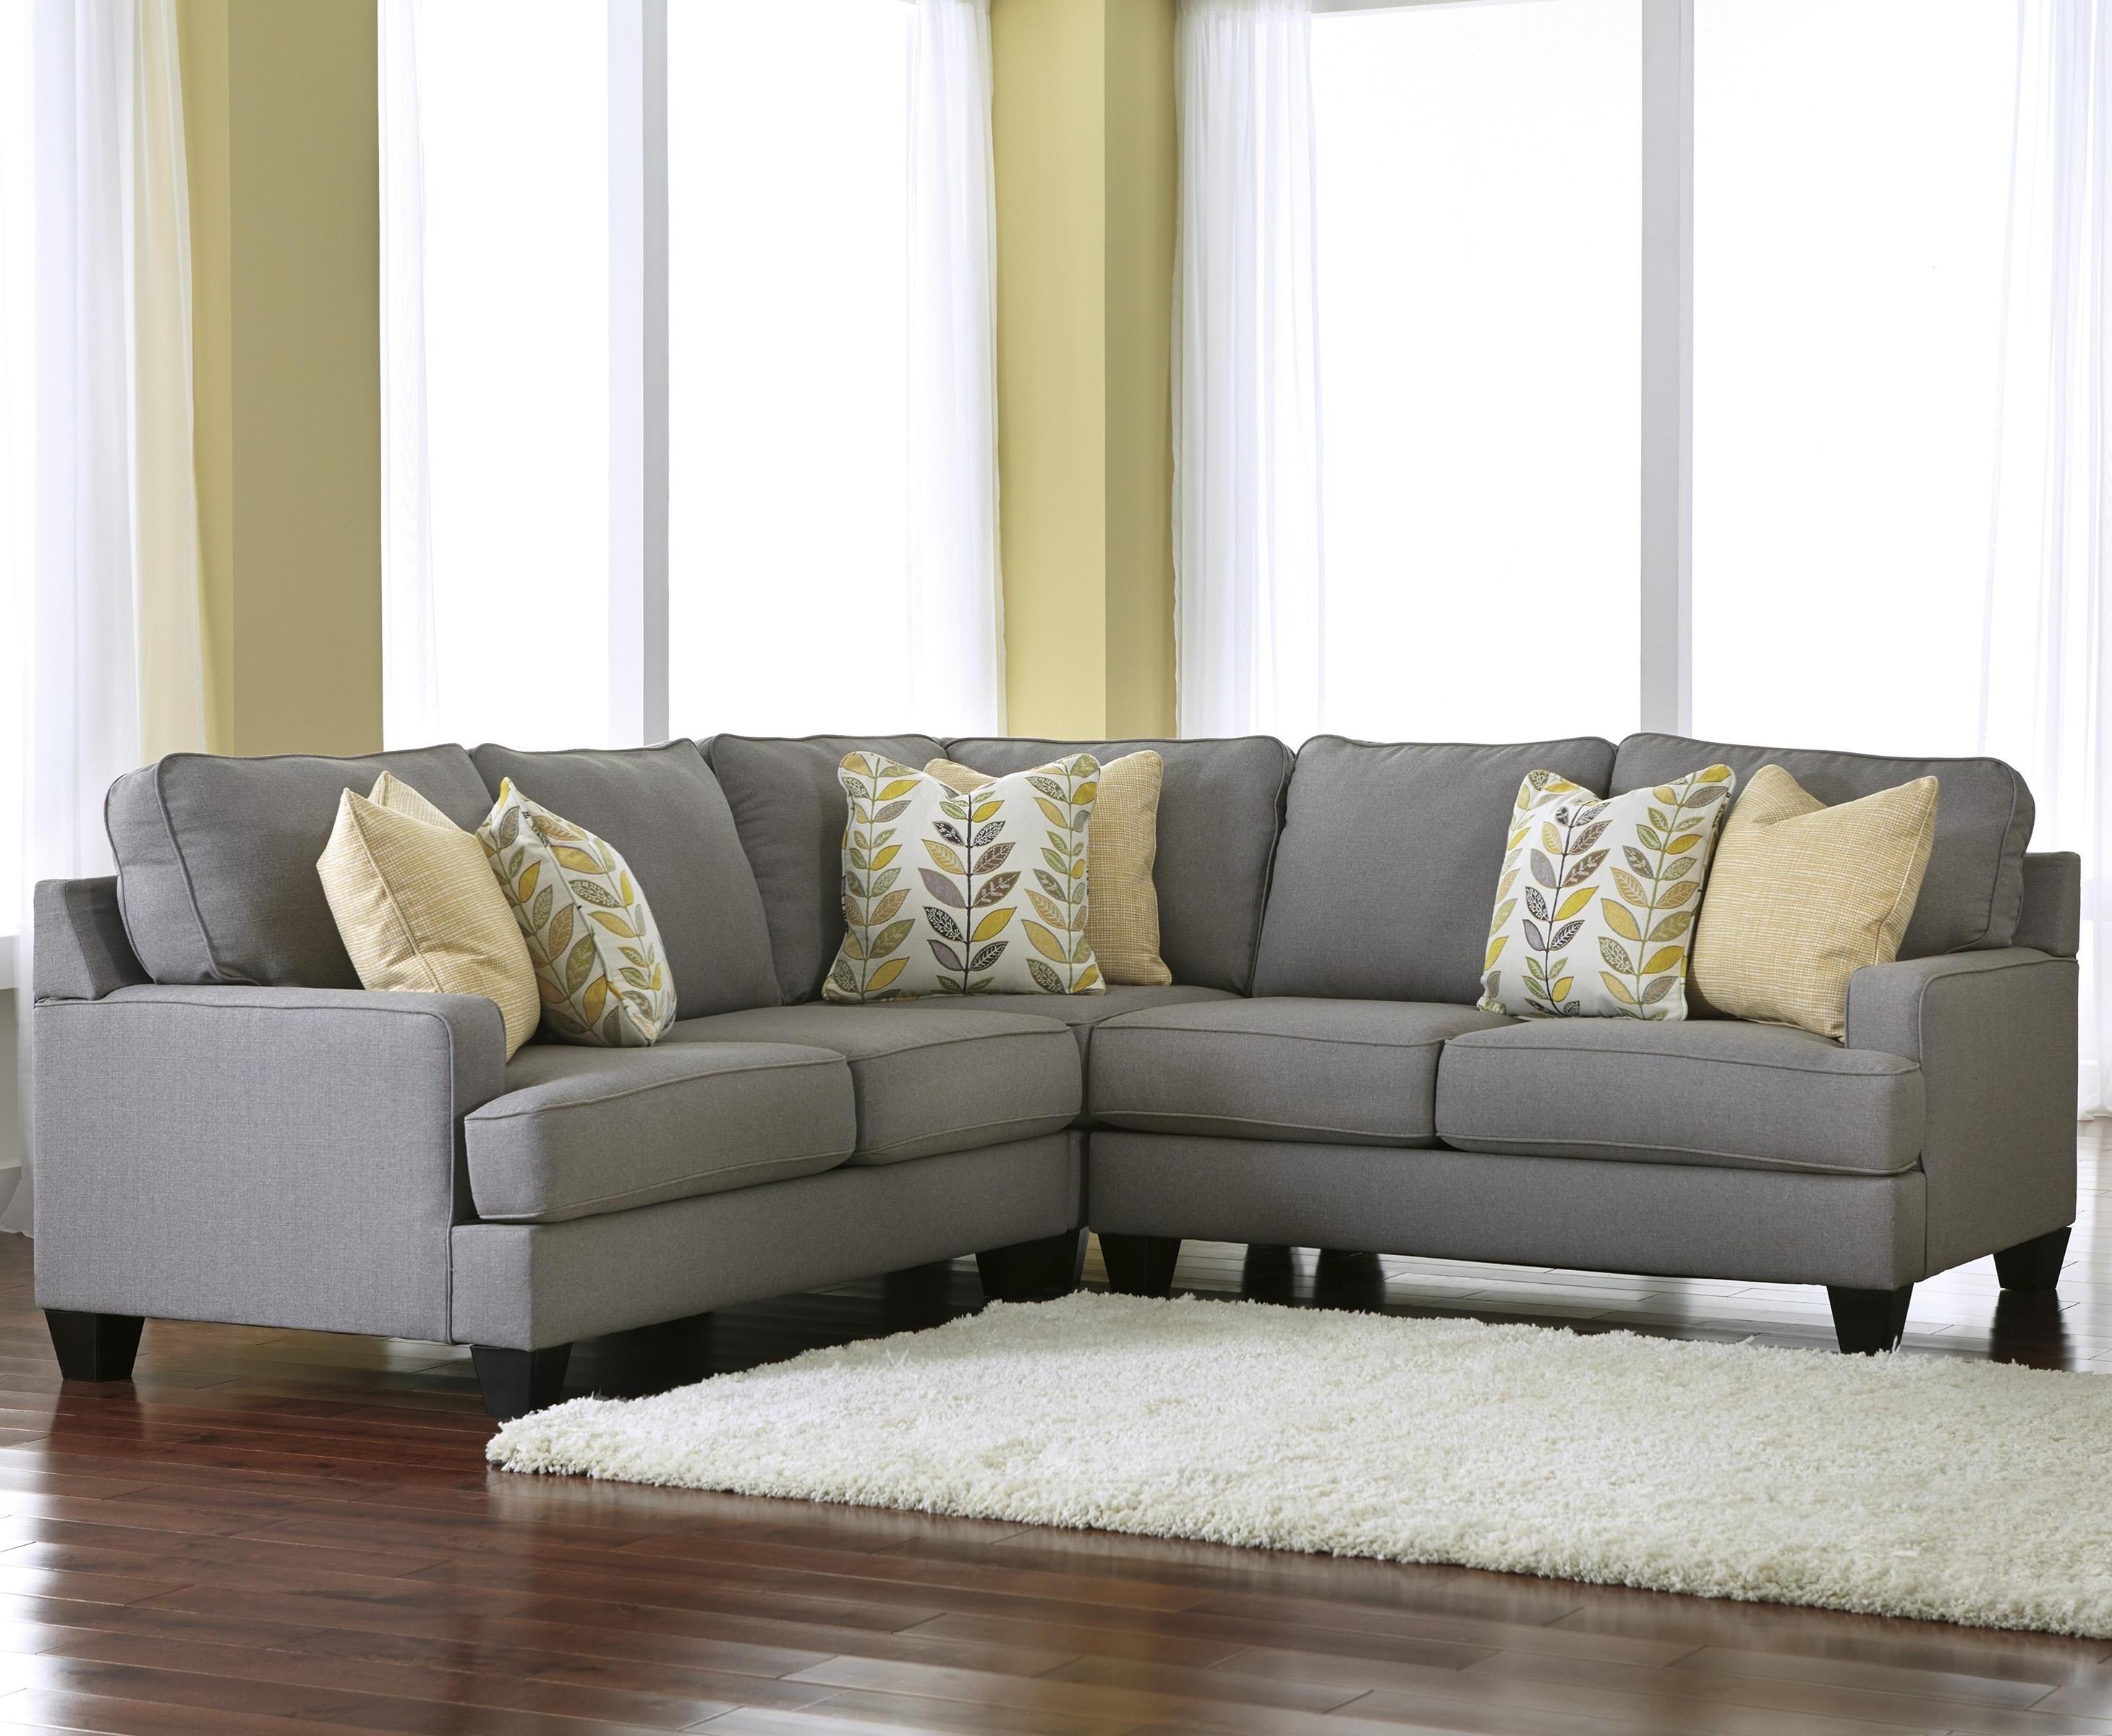 Signature Designashley Chamberly – Alloy Modern 3 Piece Corner For Latest Jonesboro Ar Sectional Sofas (View 12 of 15)